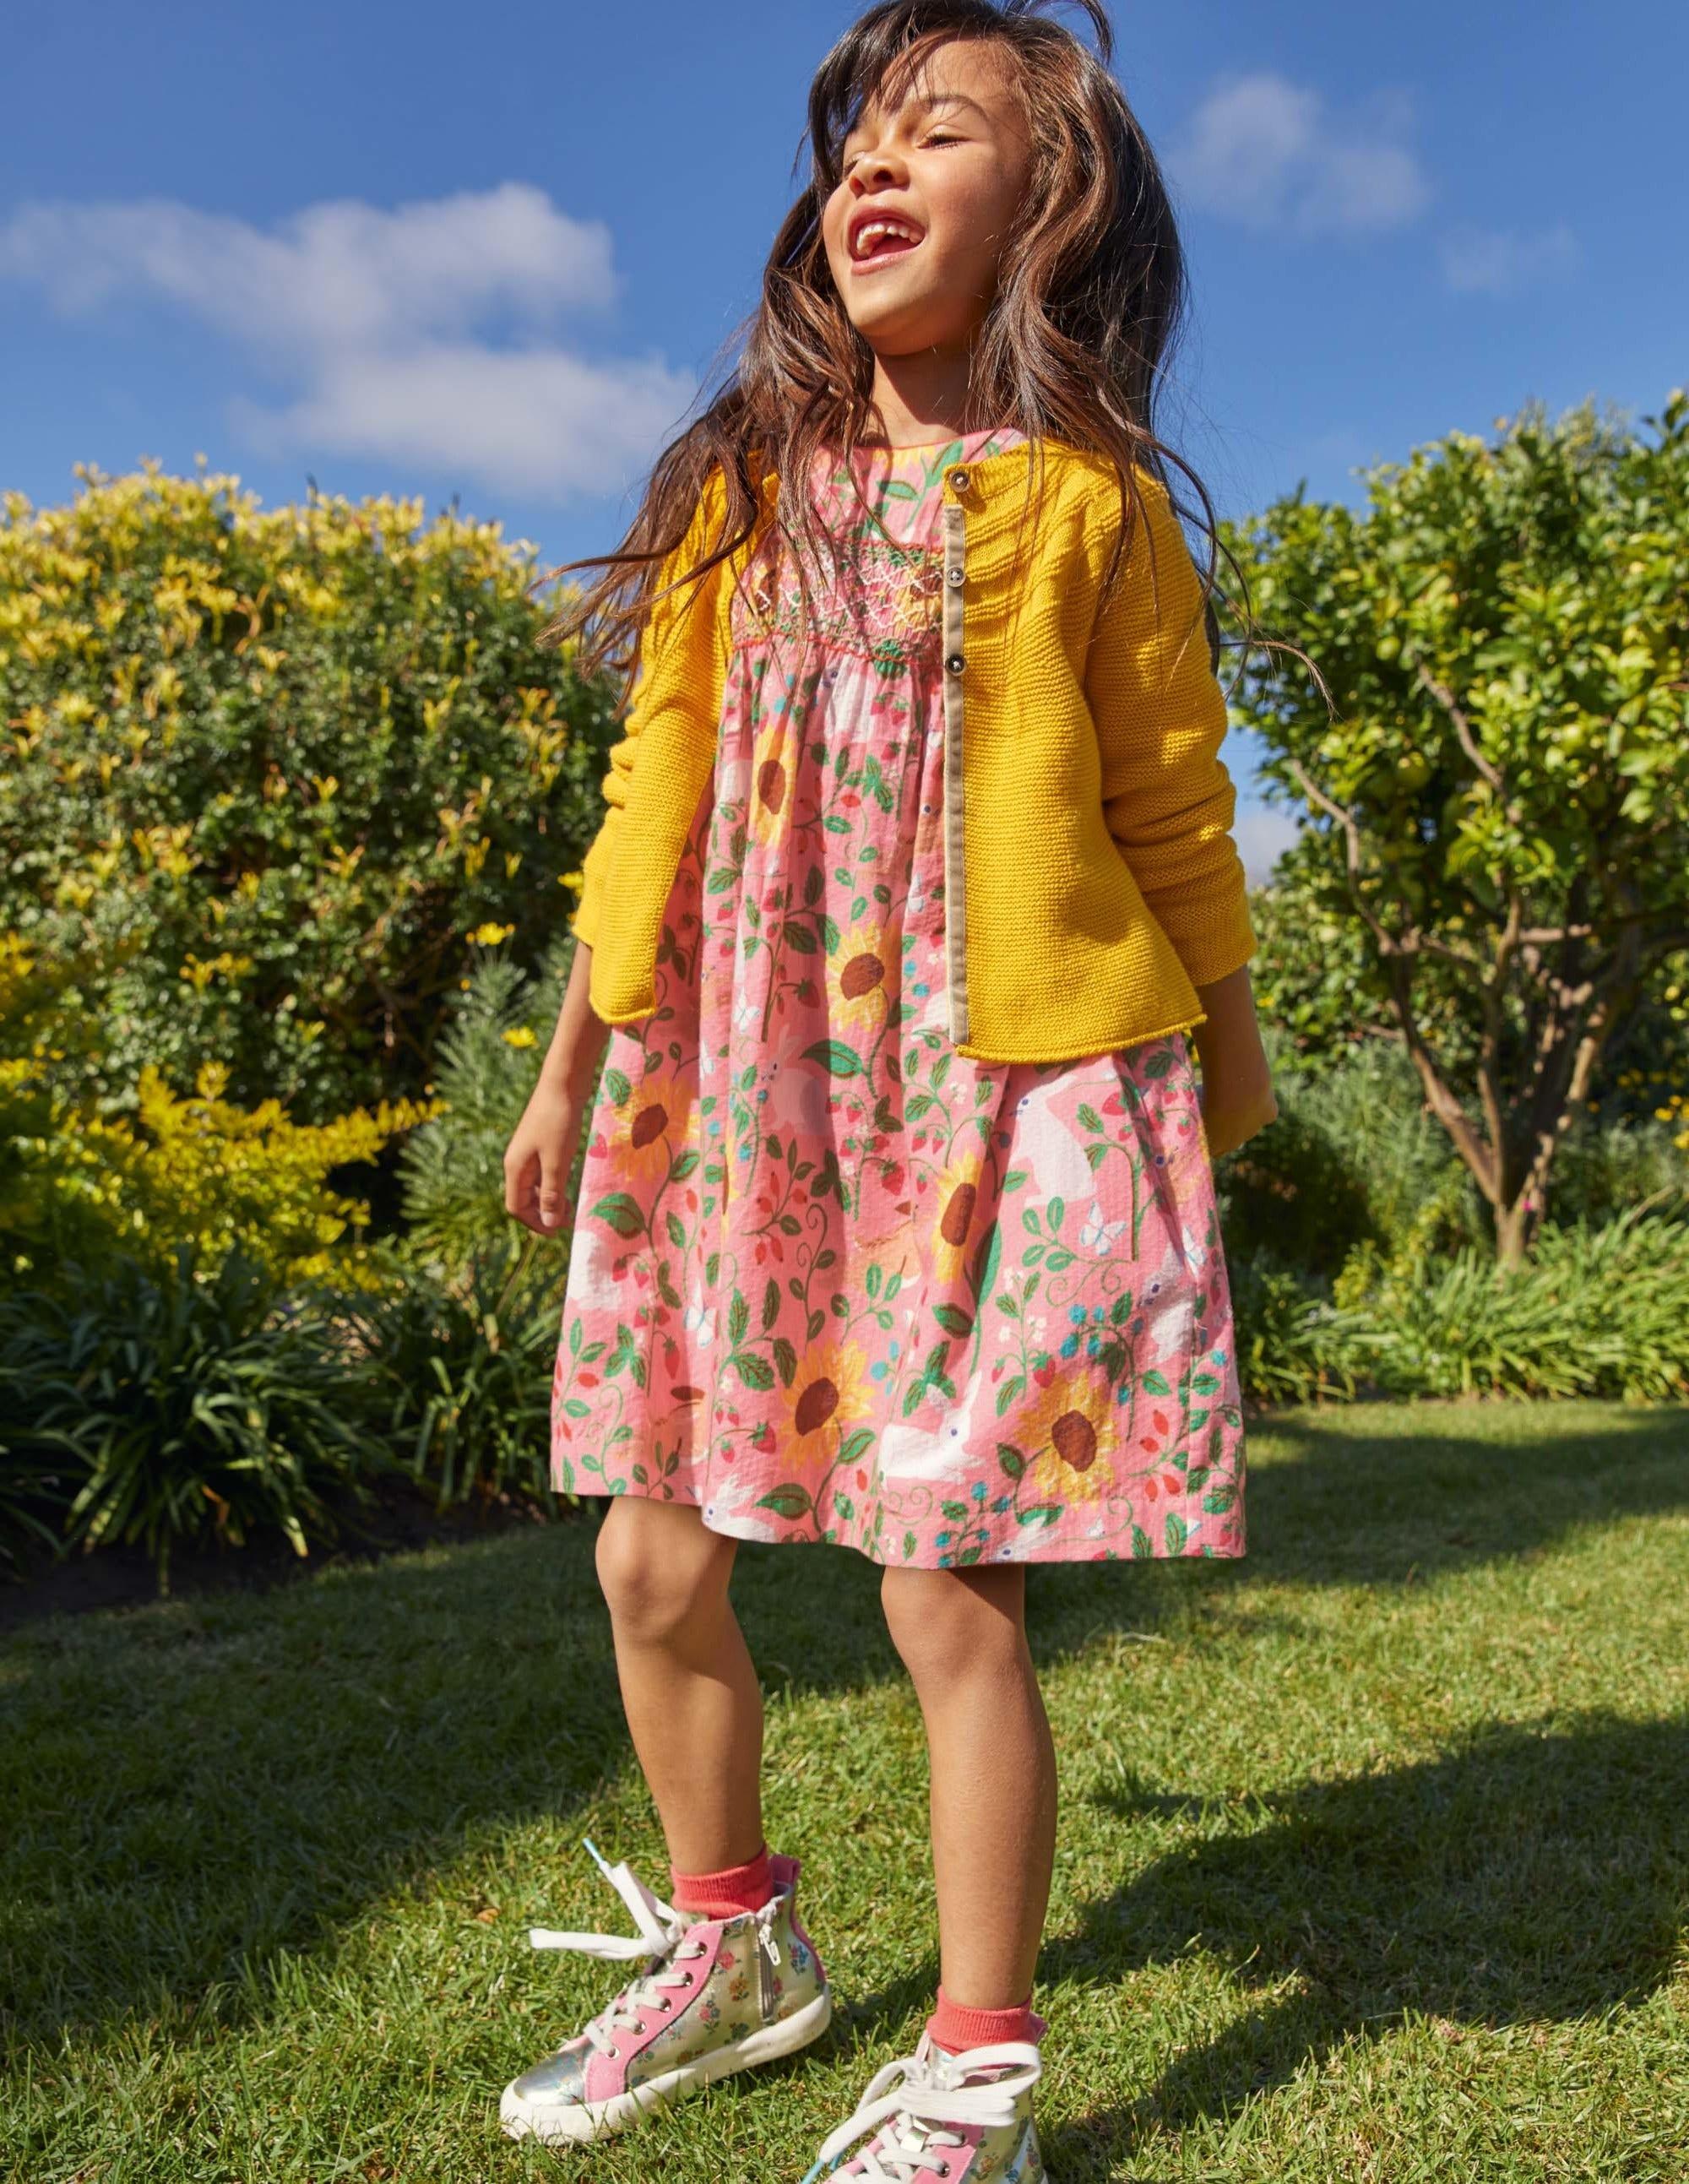 Boden Smocked Dress - Pink Lemonade Berry Patch